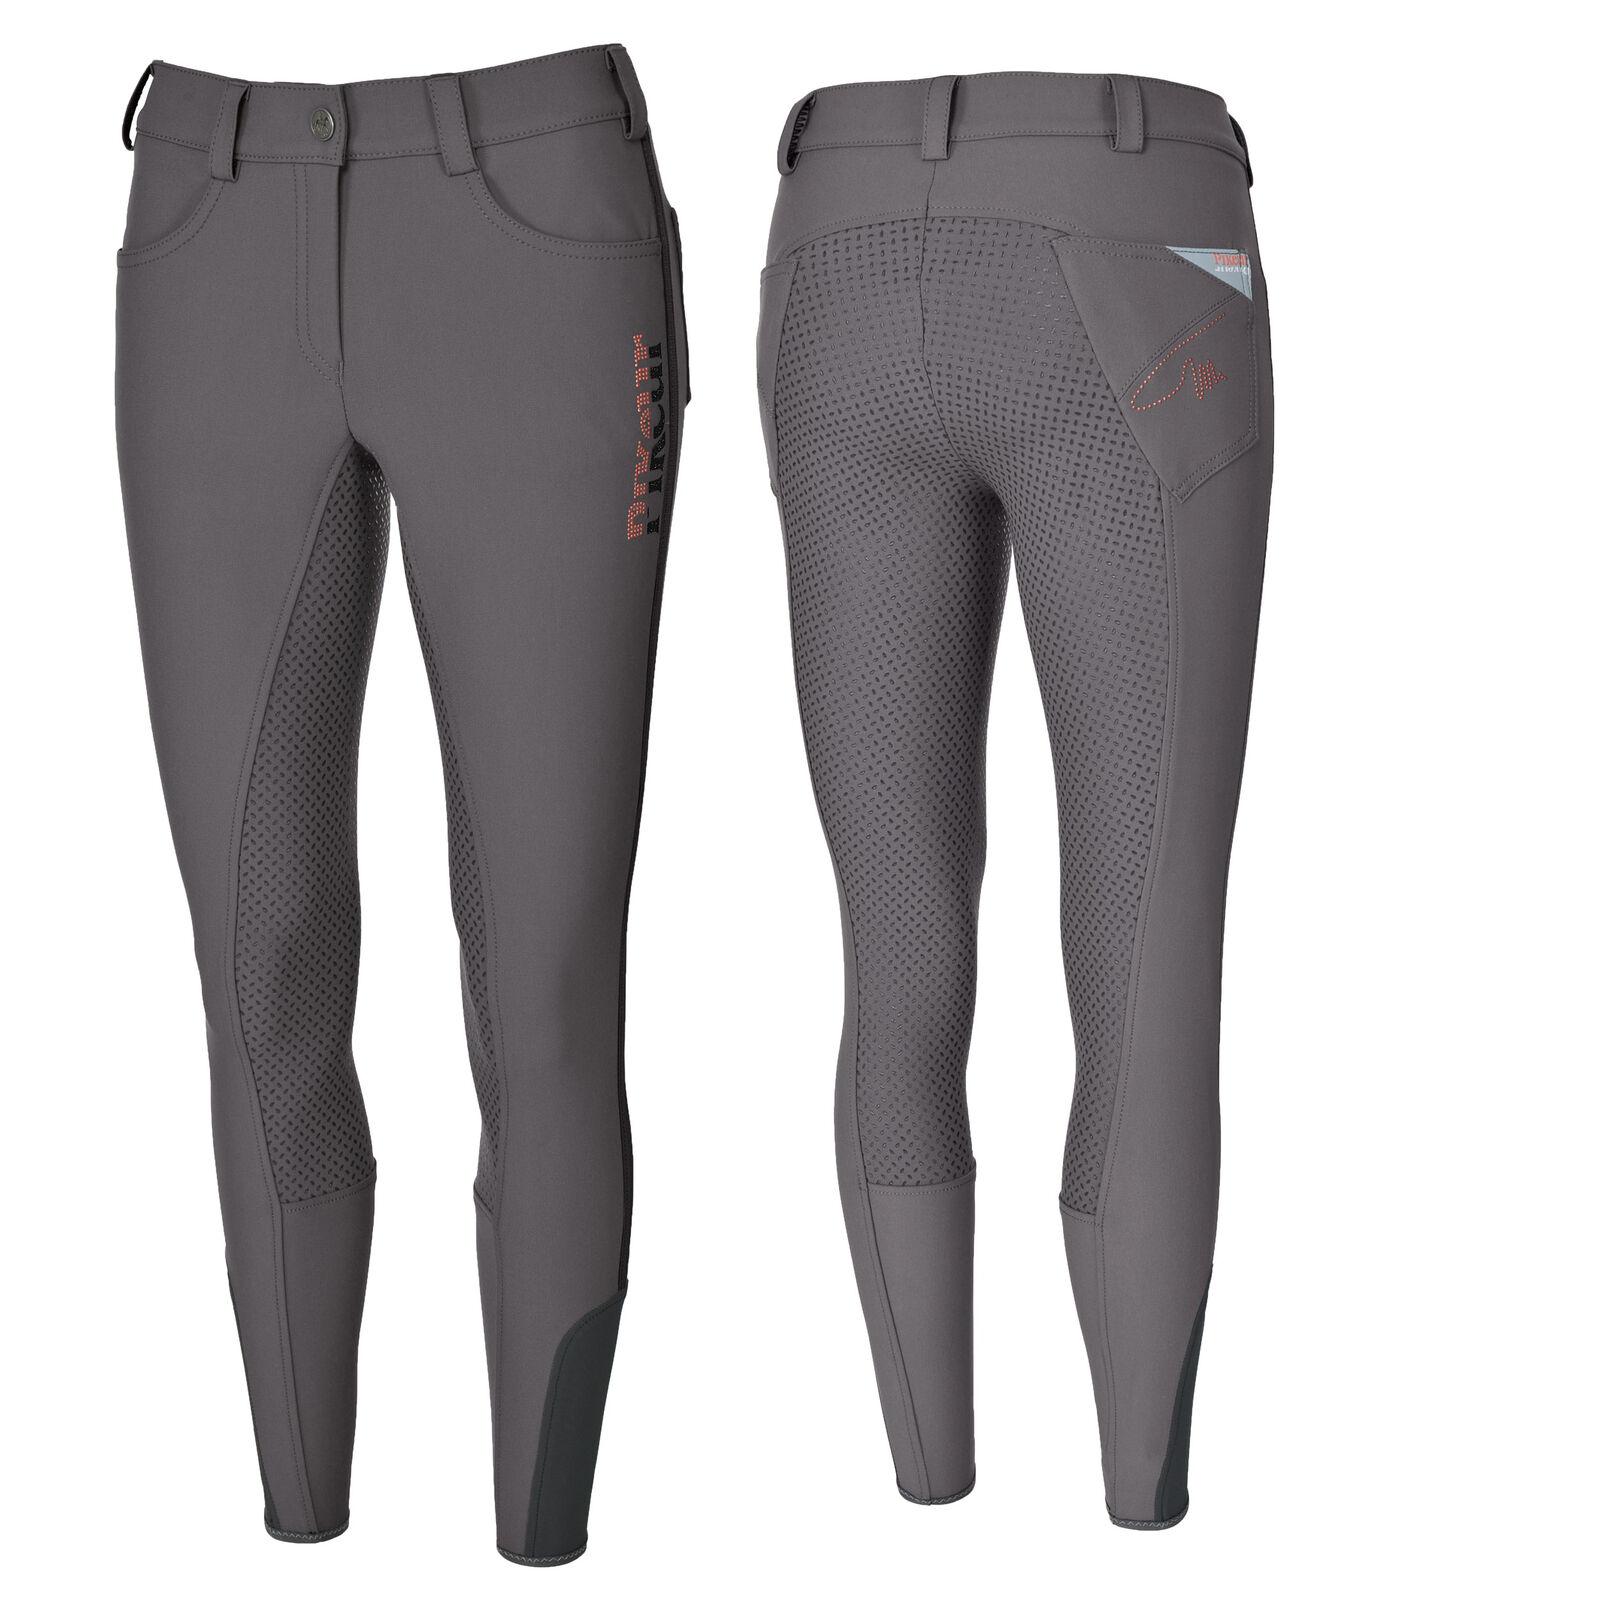 PIKEURDonna Pantalone MONTALA Fioretti GripNew Generation